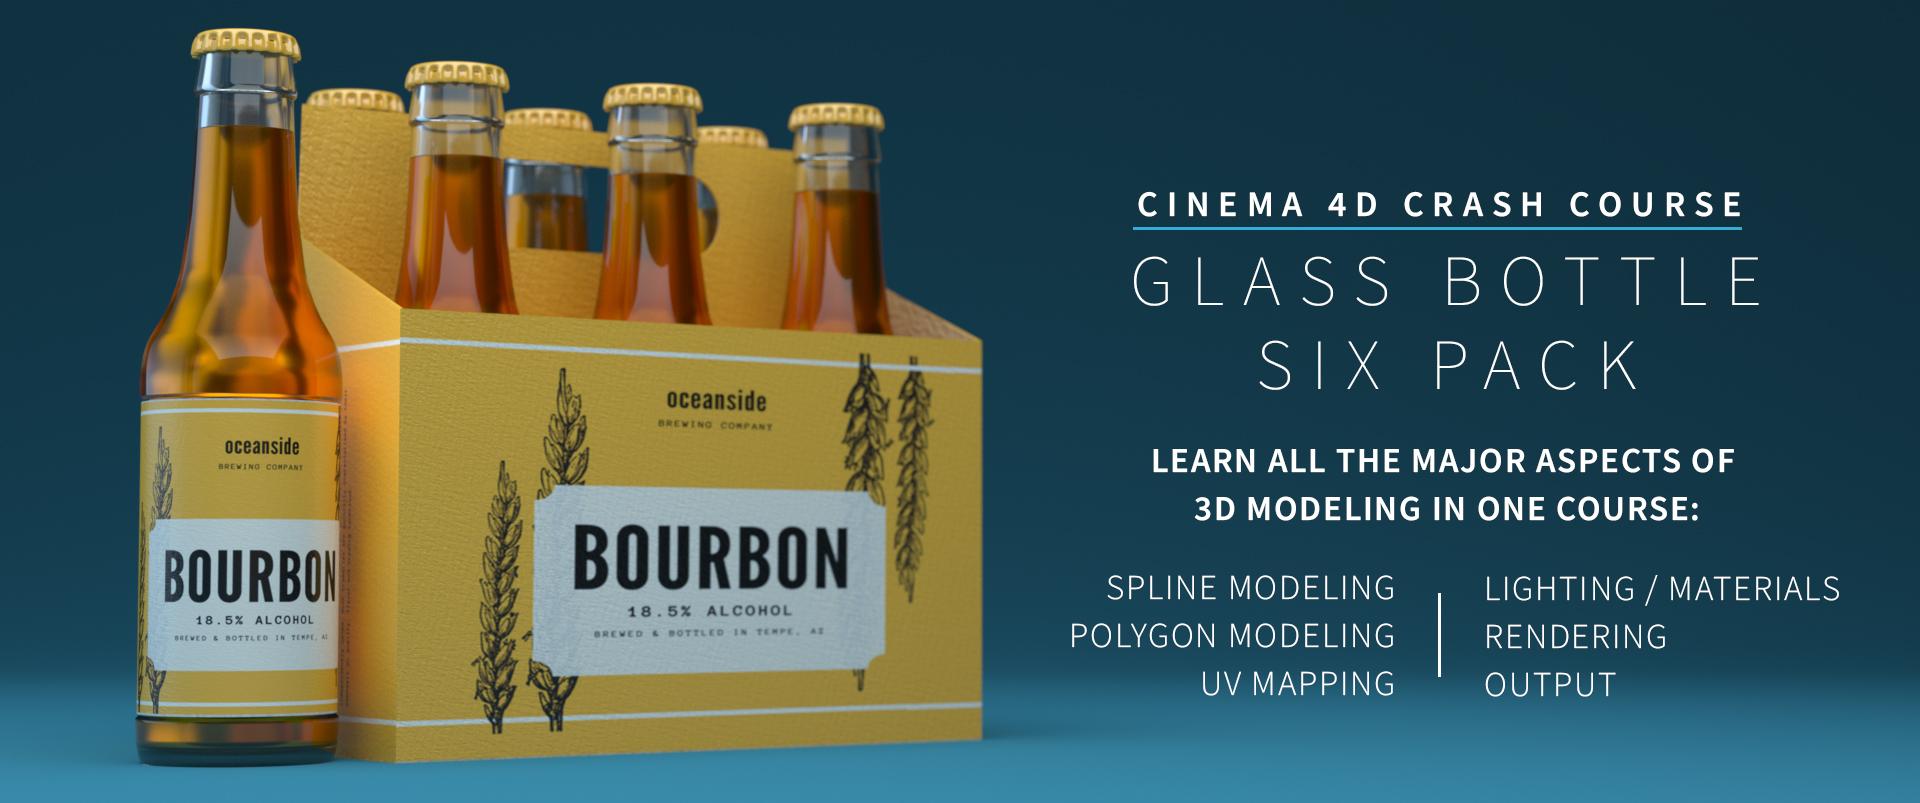 Cinema 4D Crash Course - Creating a Six Pack | Pixl Pyro